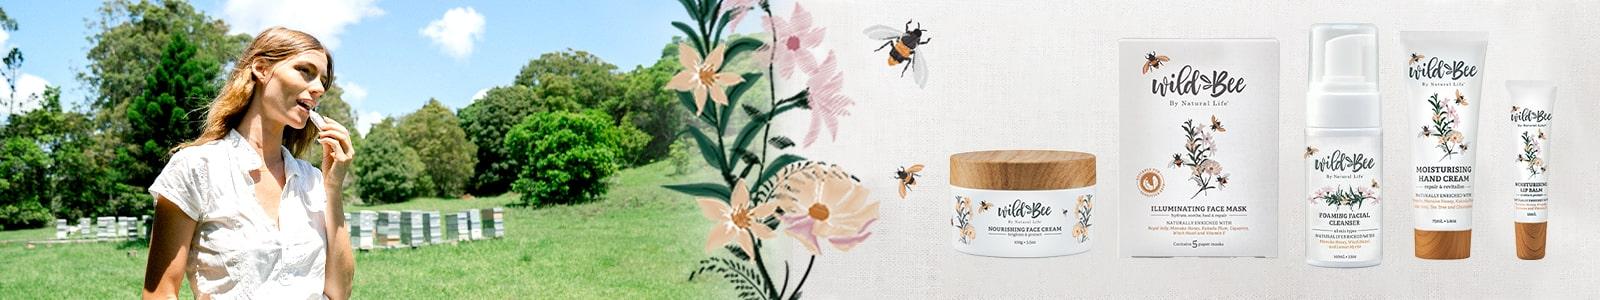 Natural Life's banner